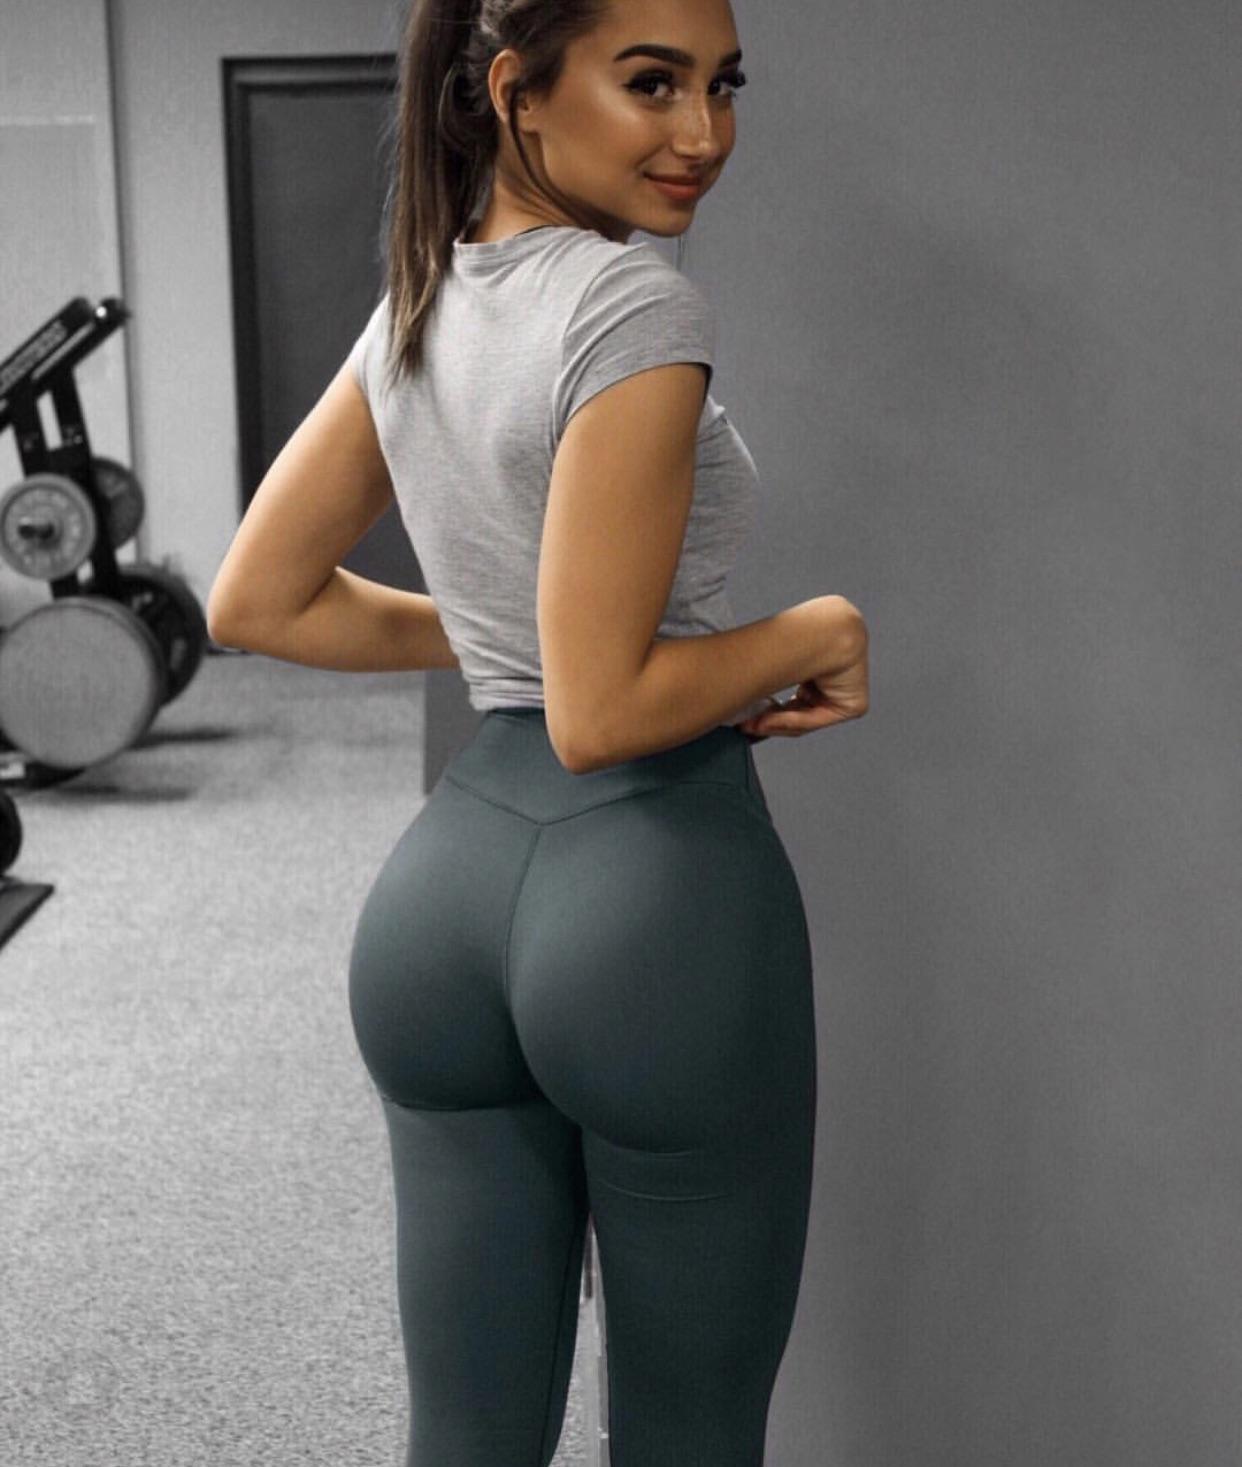 No equipment butt and thigh workout